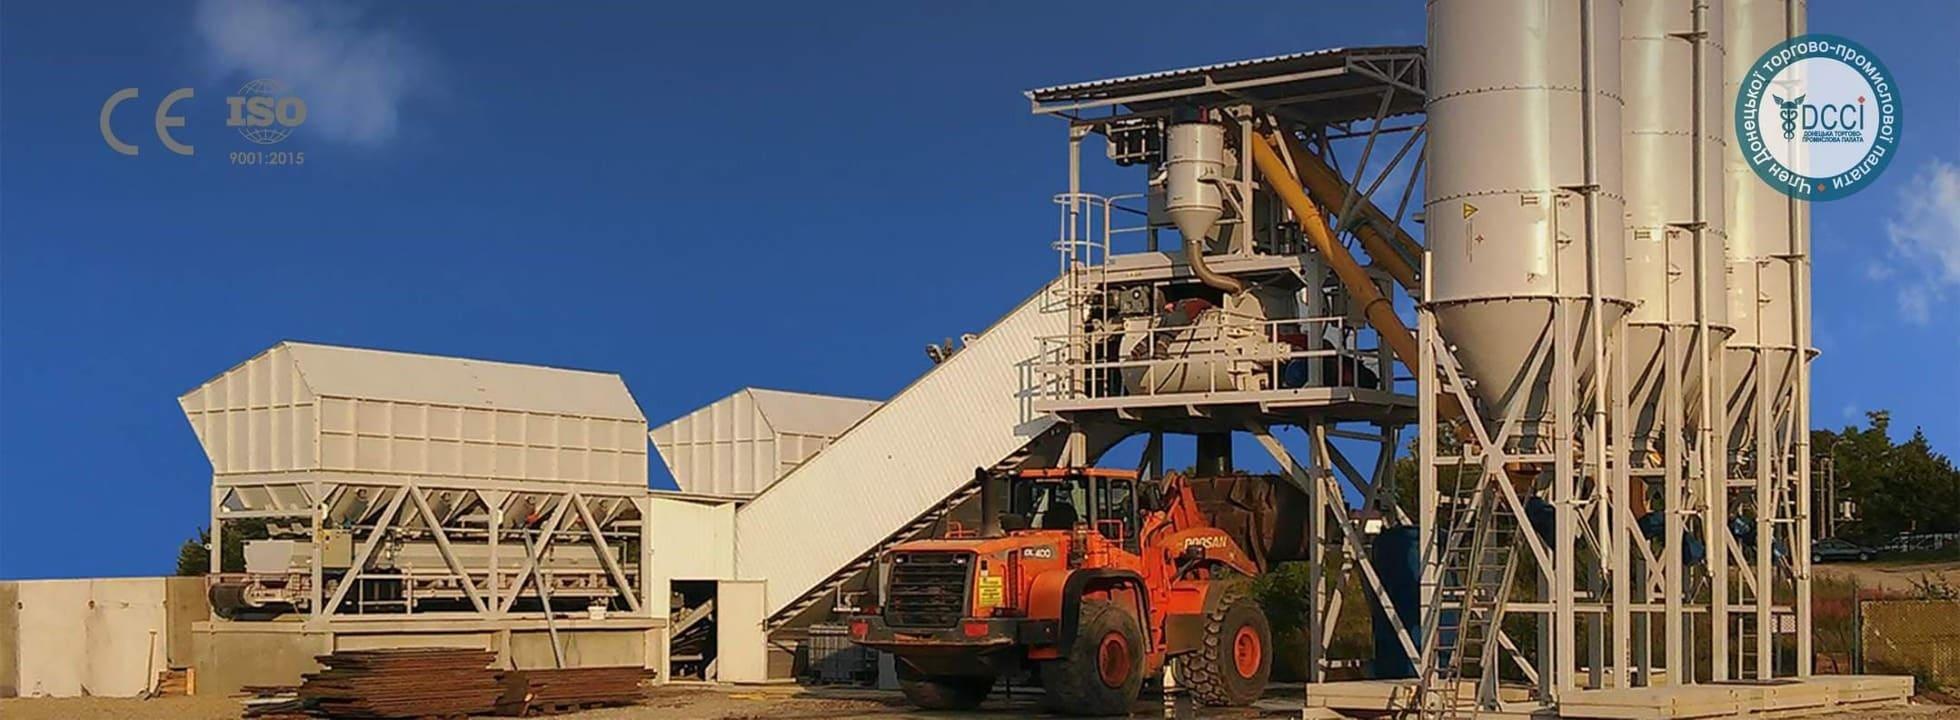 Machine-building plant Betonmash Ukraine